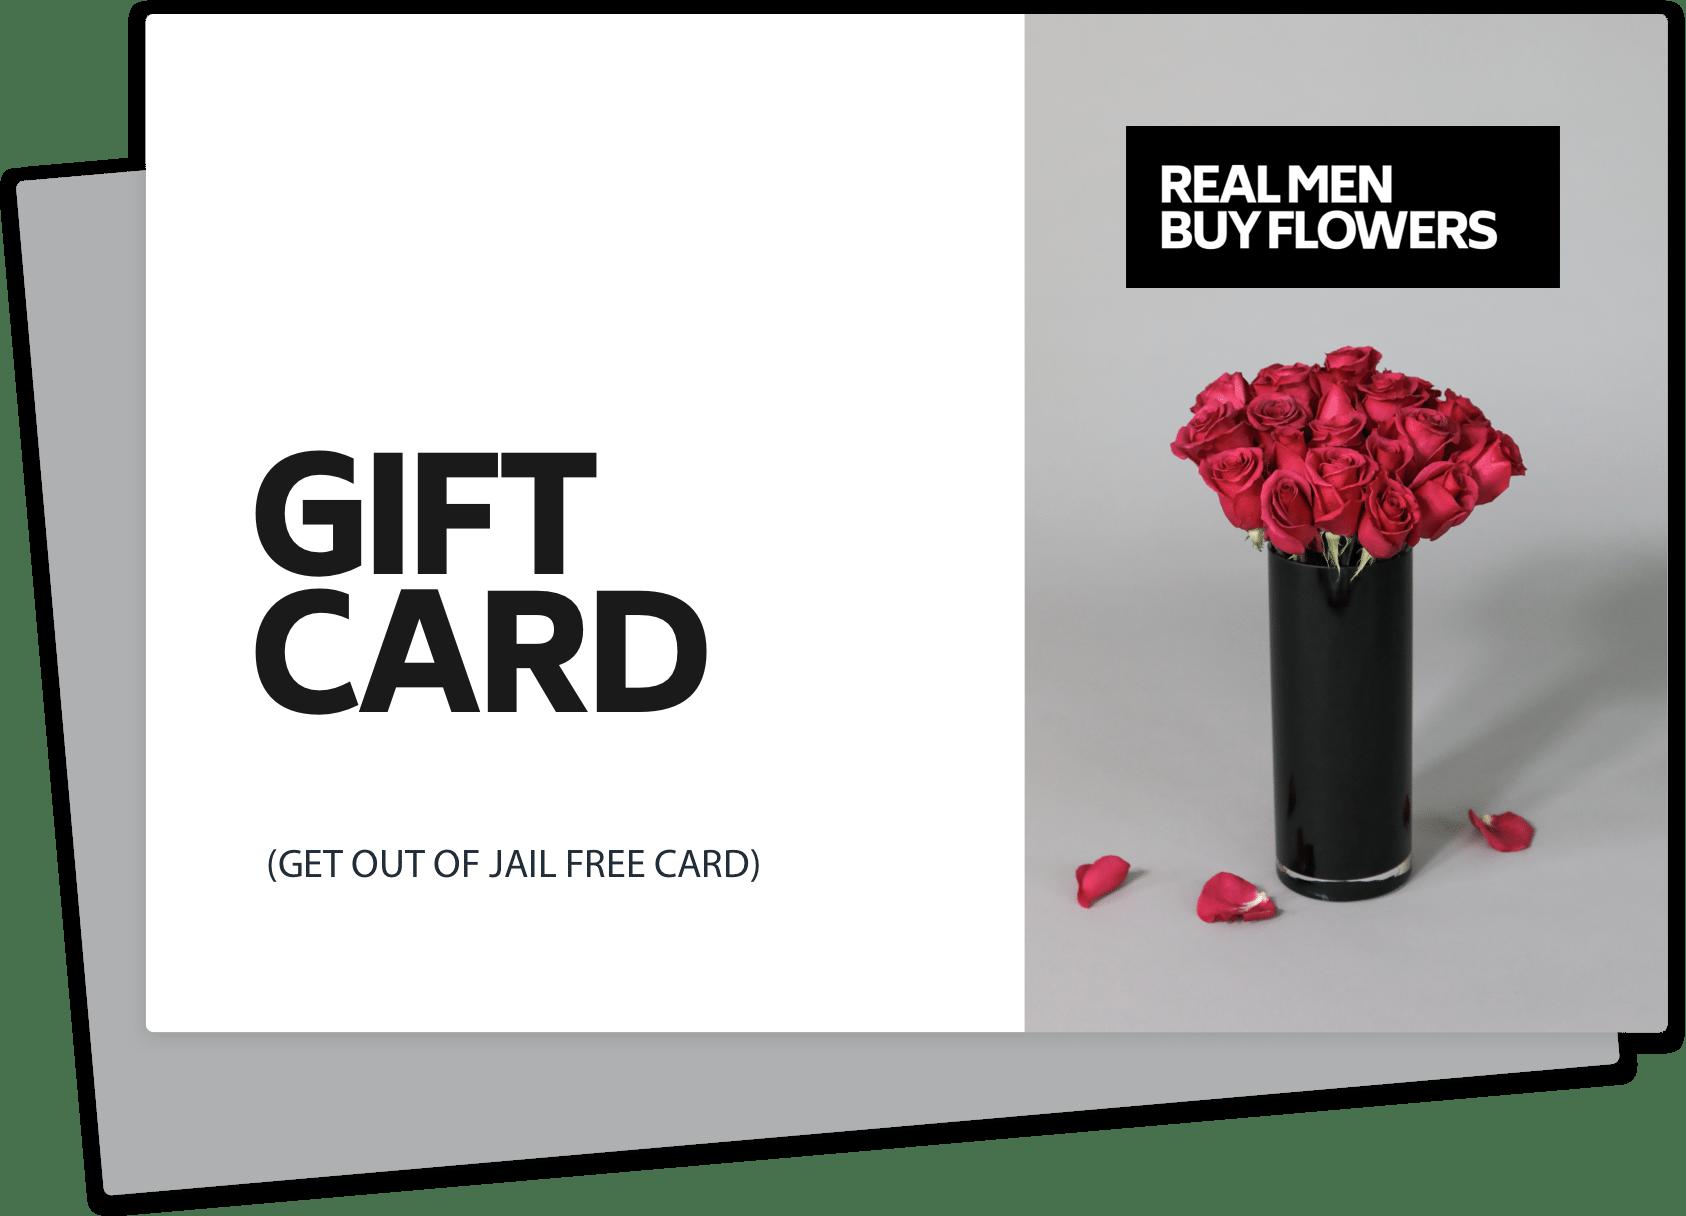 Gift Cards Real Men Buy Flowers